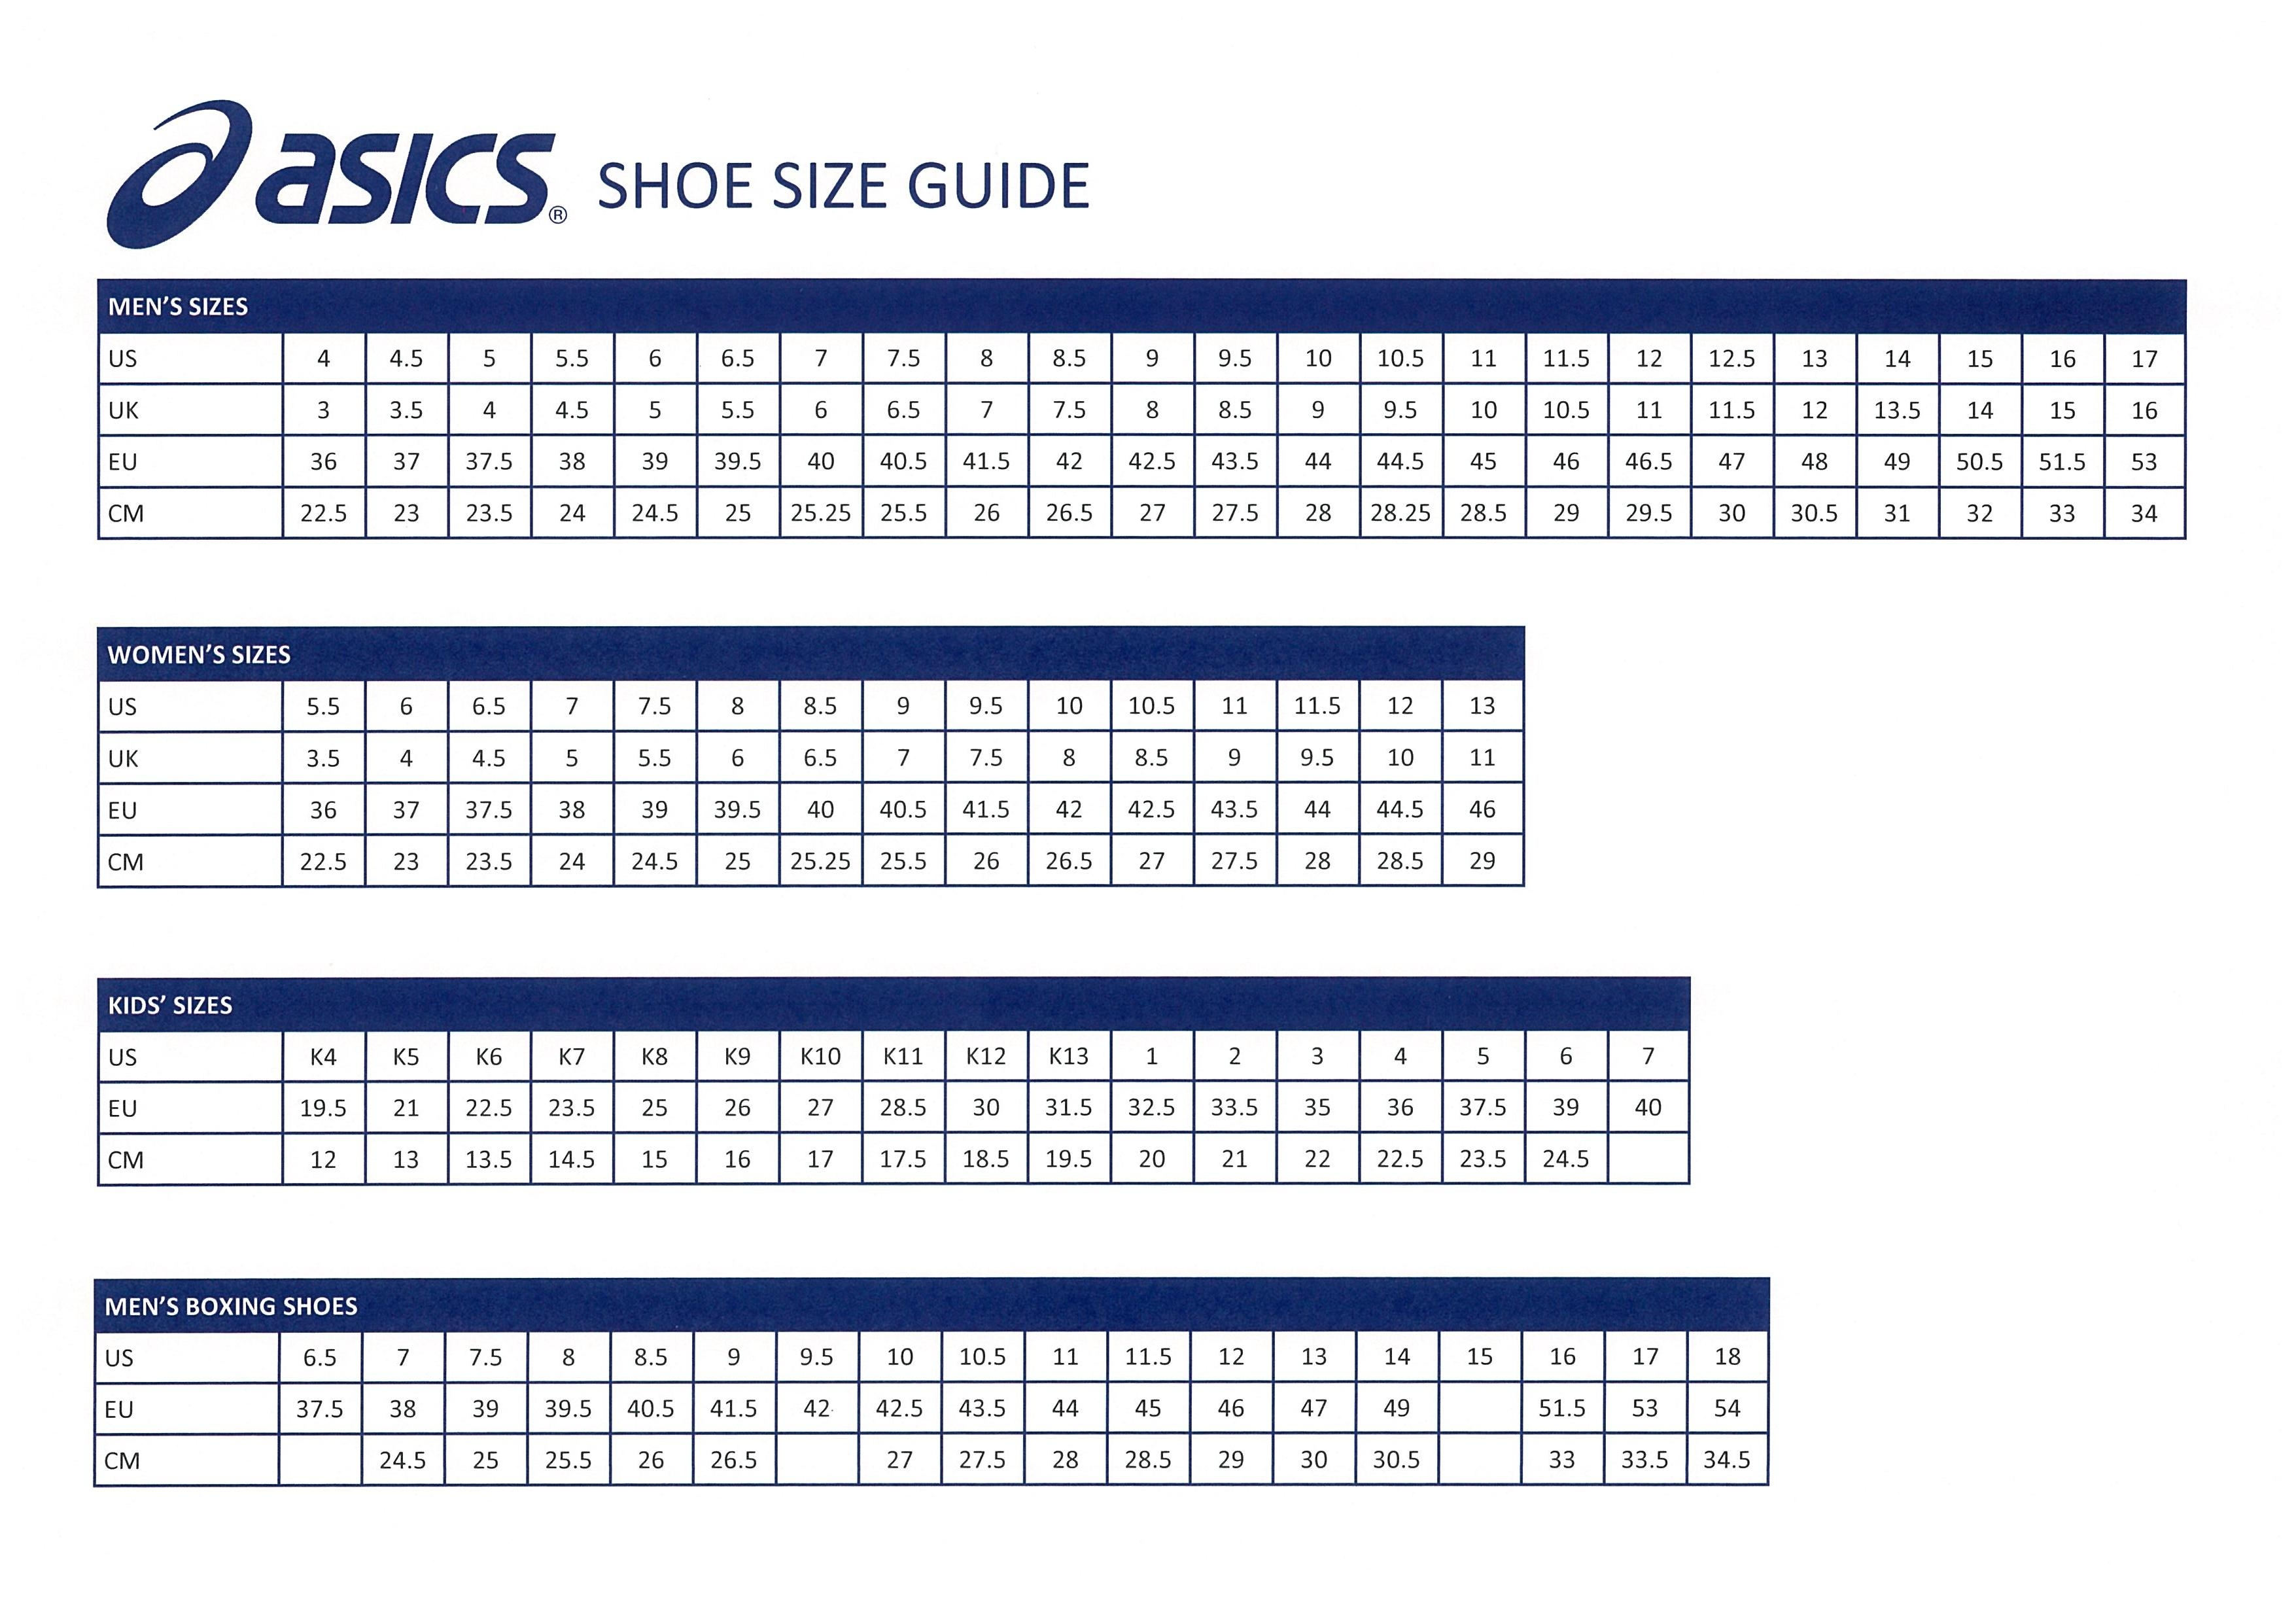 asics footwear size chart - 57% remise - www.muminlerotomotiv.com.tr